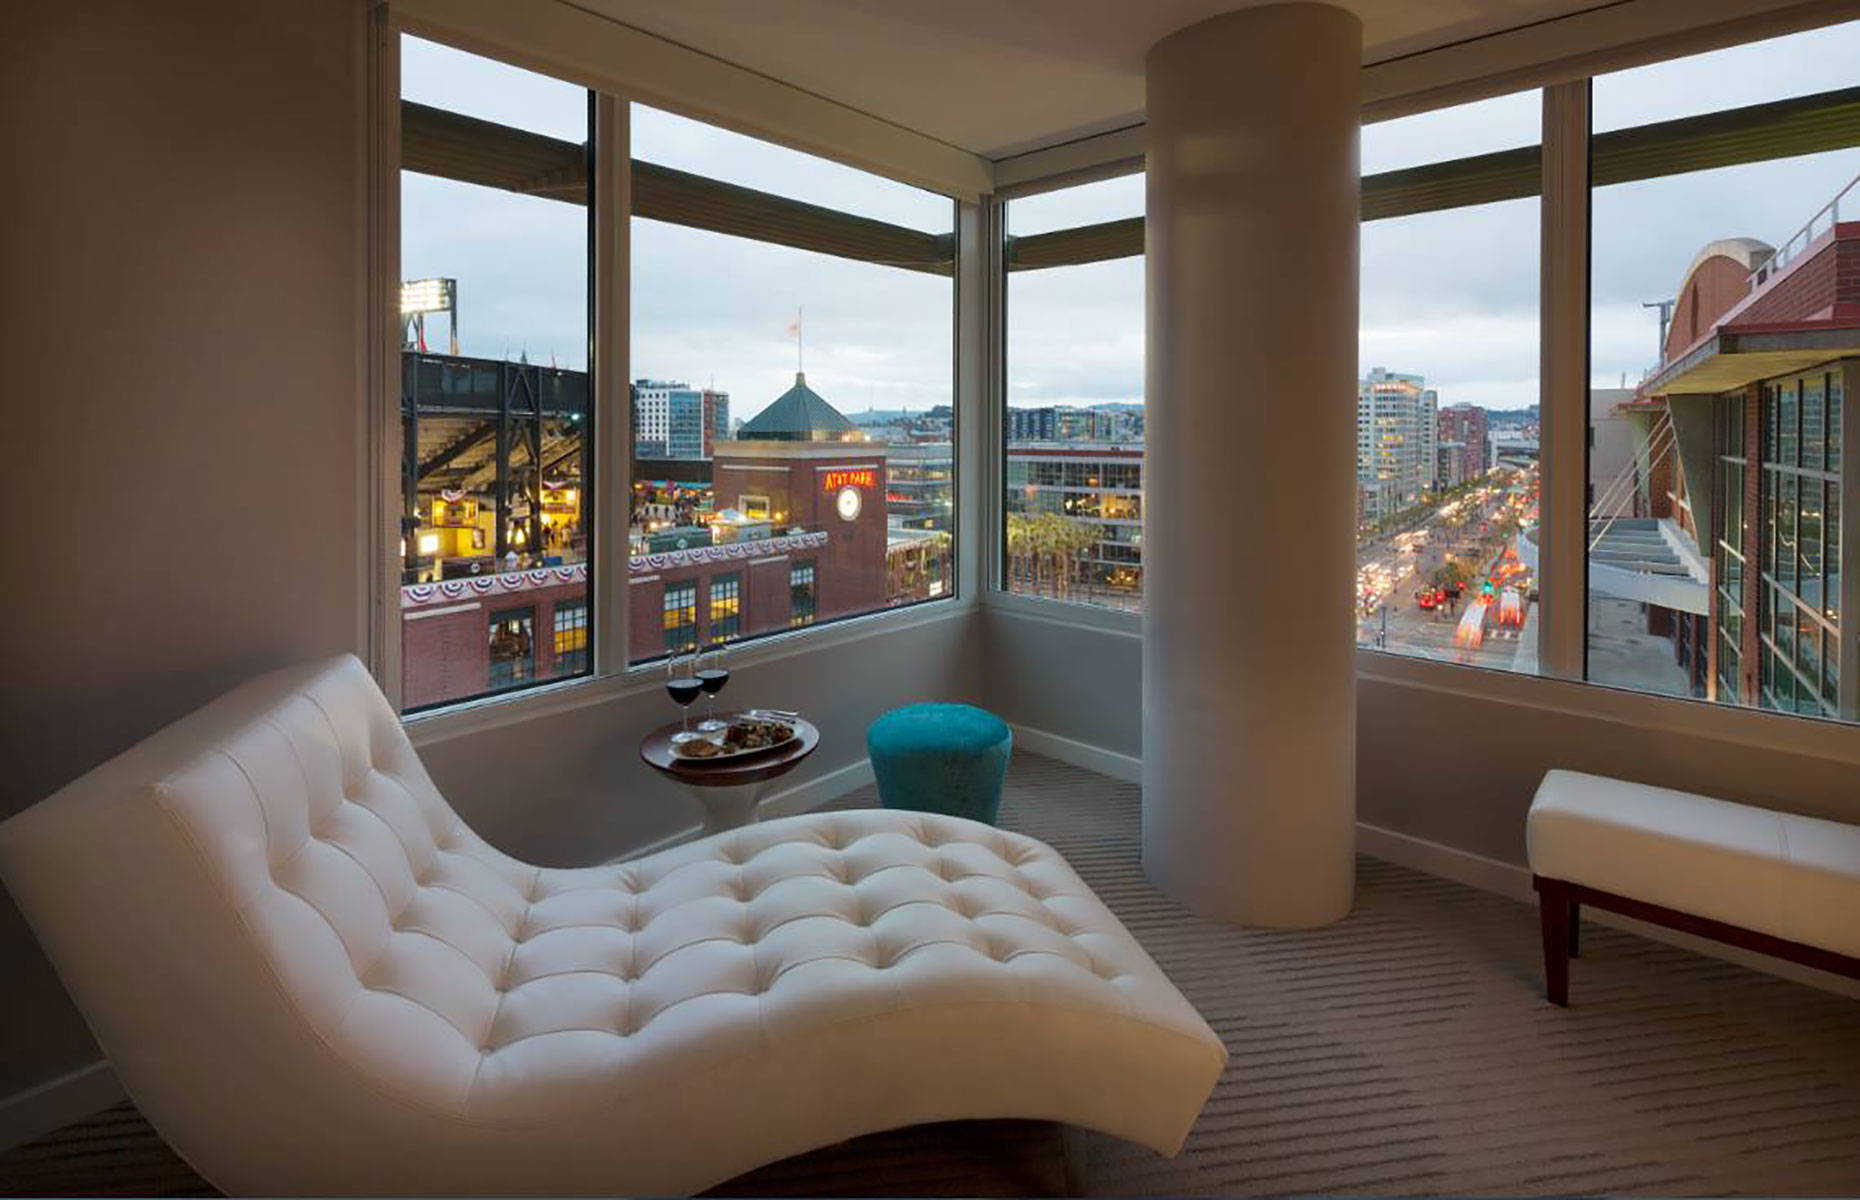 Hotel VIA room (Image: hotelviasf/Facebook)